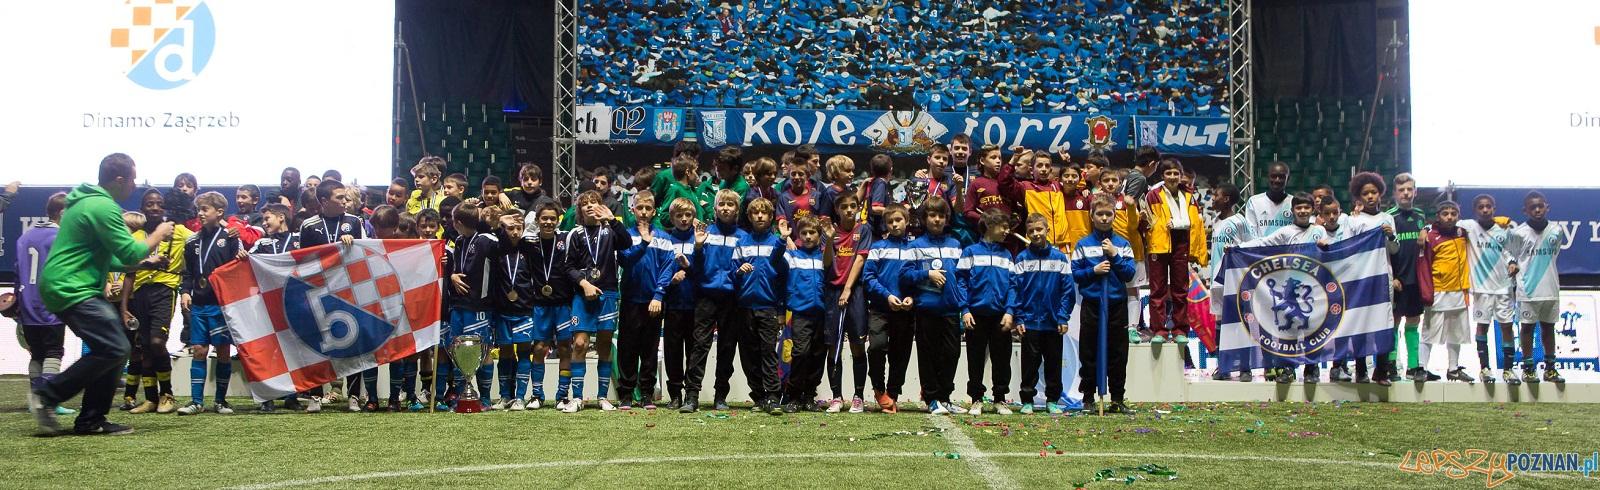 Lech Cup final  Foto: